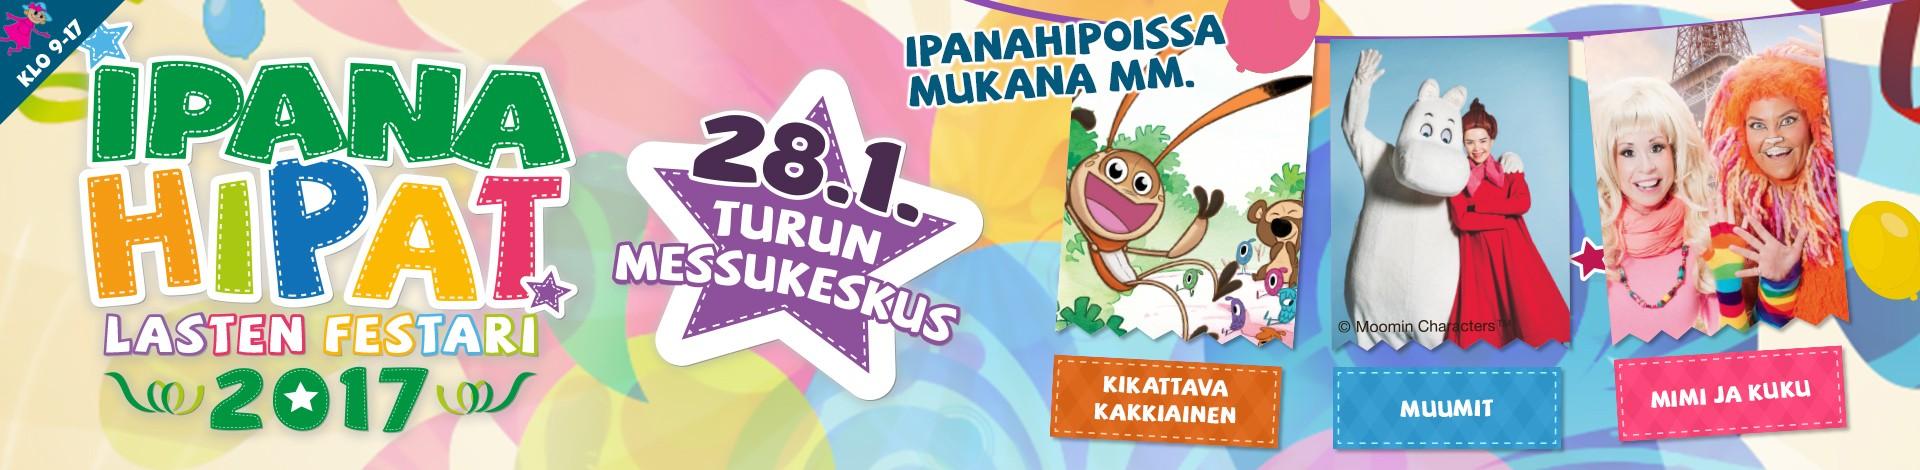 ipanahipat2017_banneri_messukeskus_1920x470